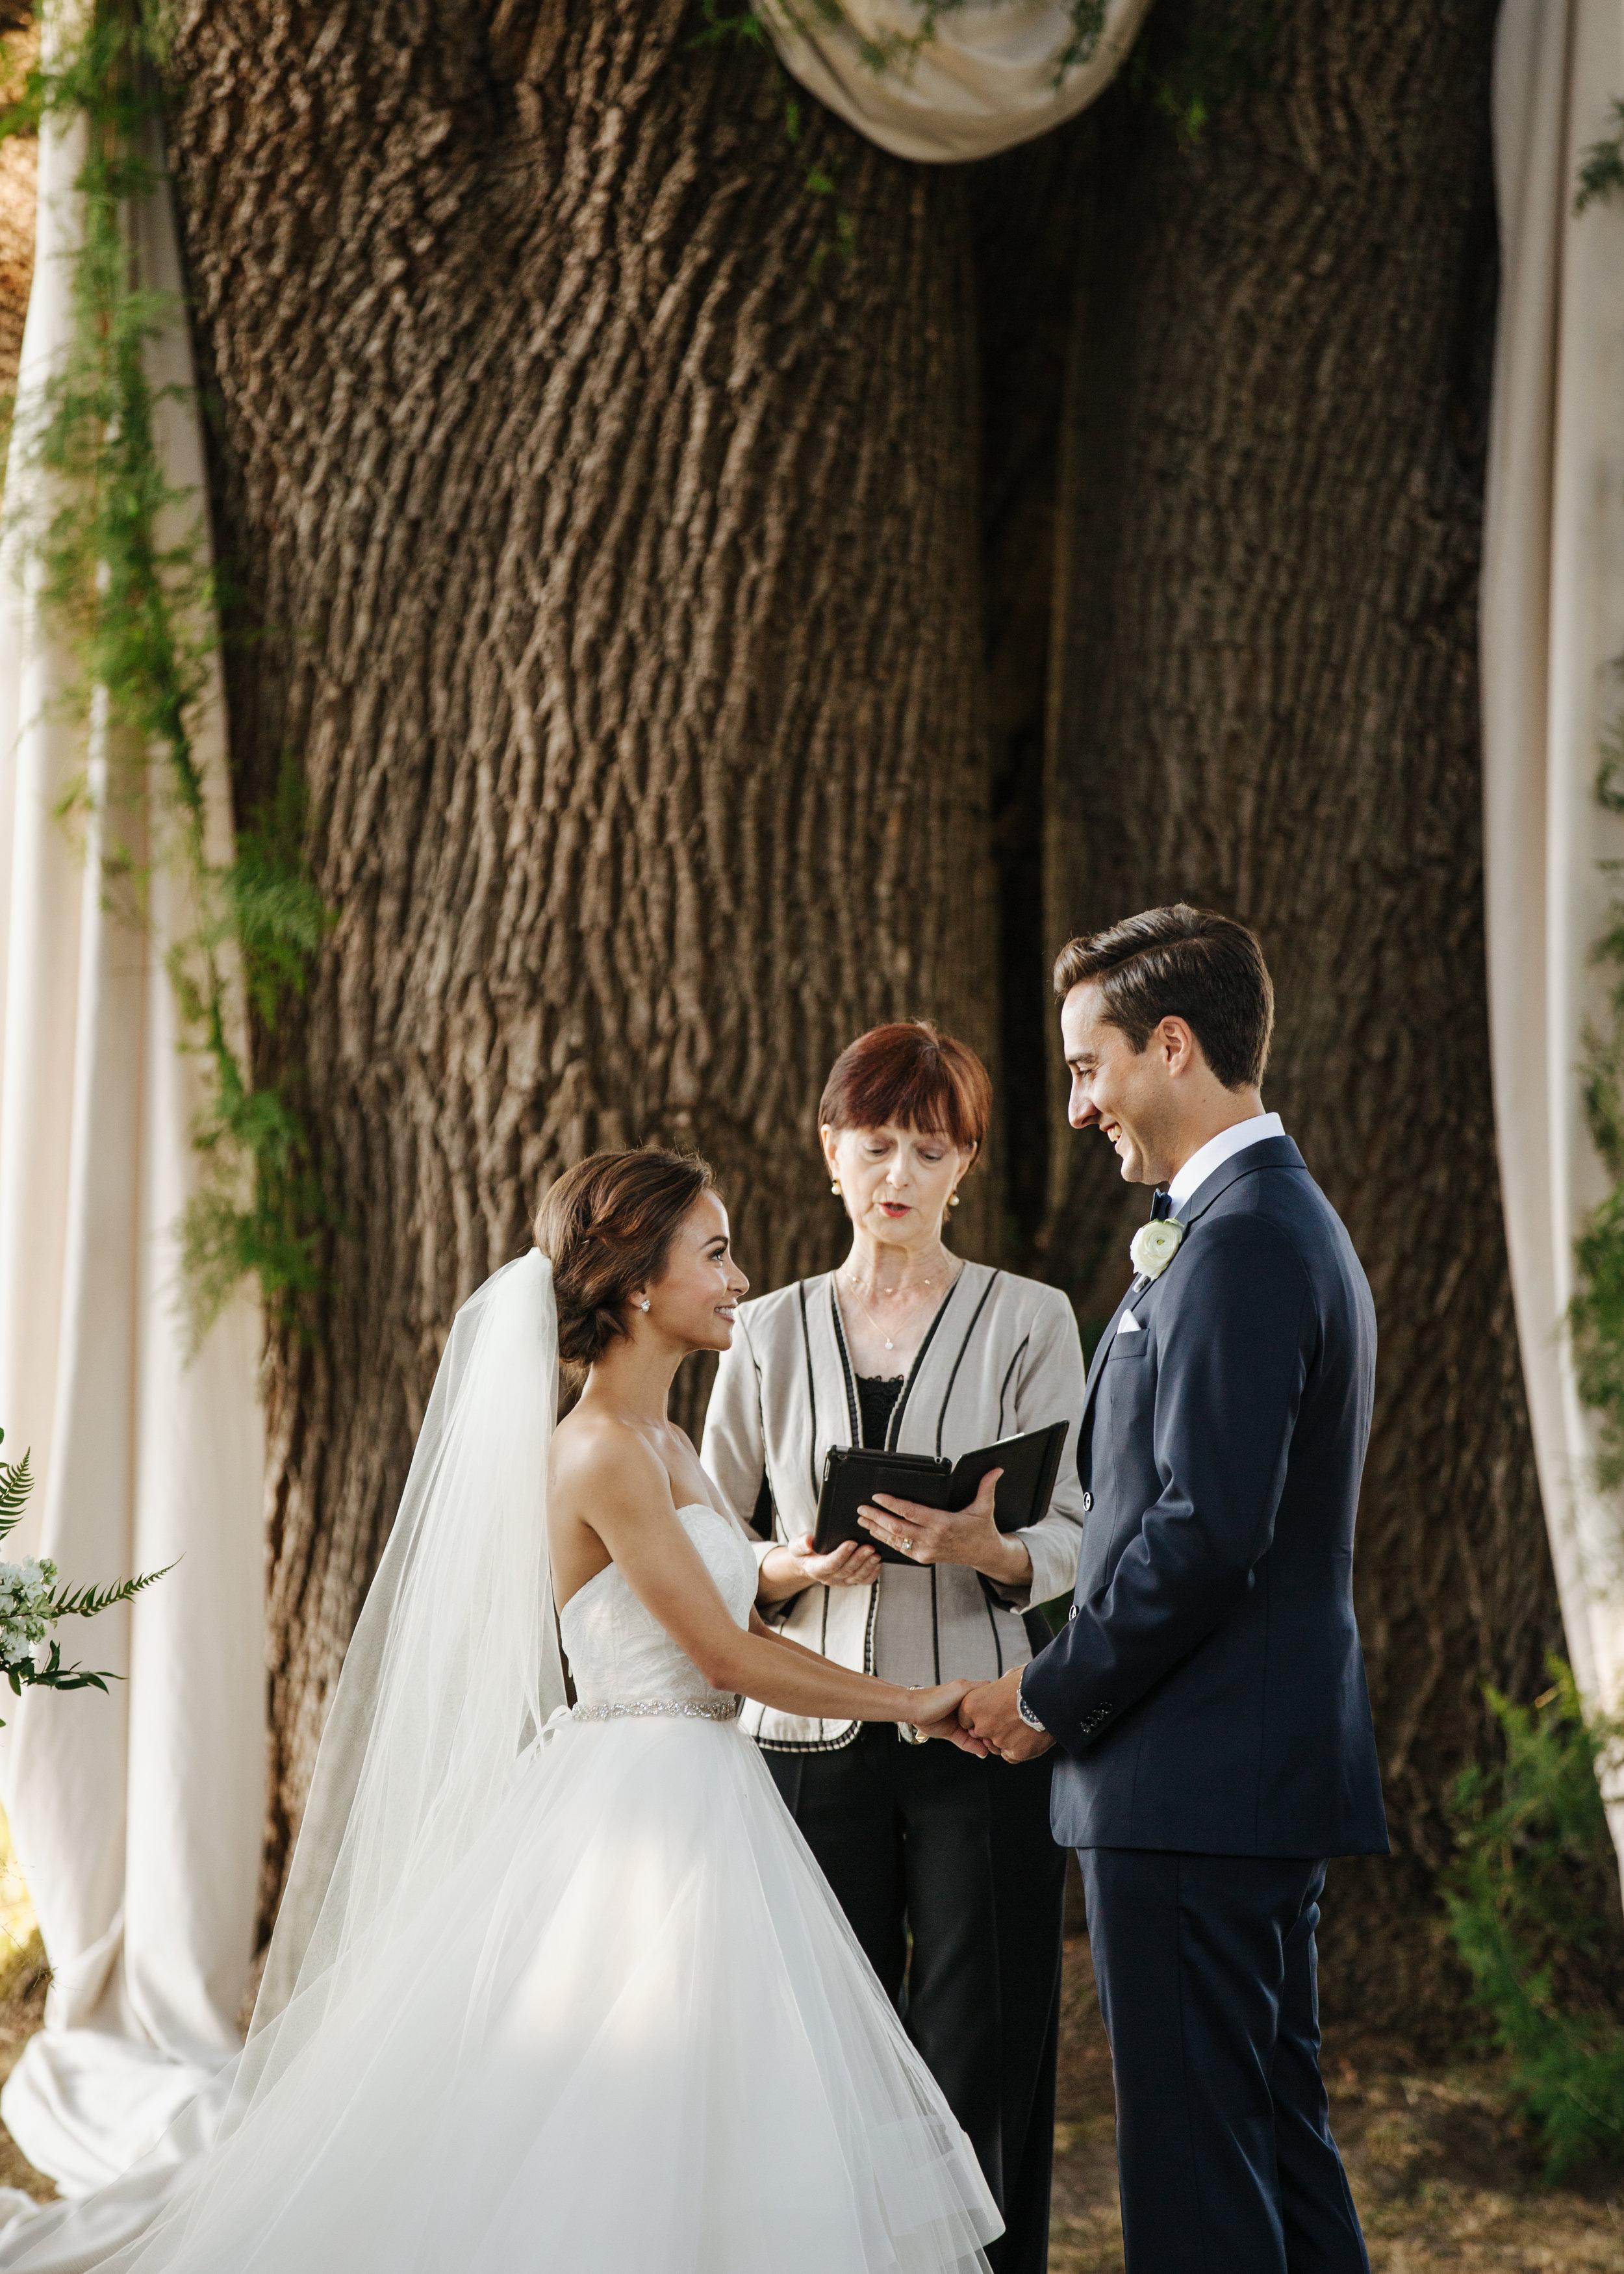 herafilms_carlotta_alex_wedding_hera_highres-48.jpg